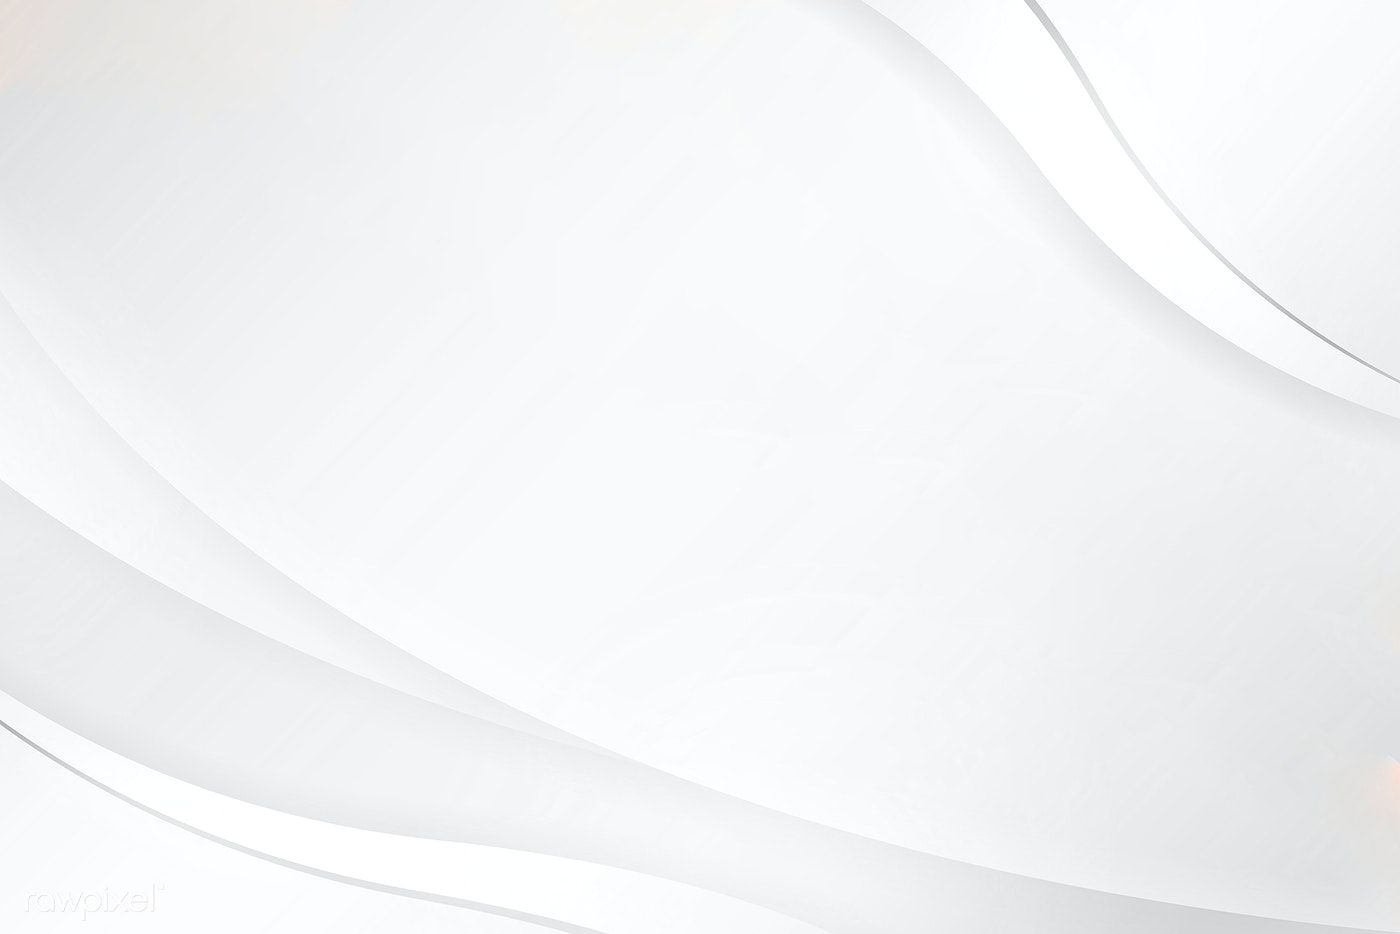 Download Premium Illustration Of Grayish White Plain Background Plains Background White Background Plain Backdrops Backgrounds